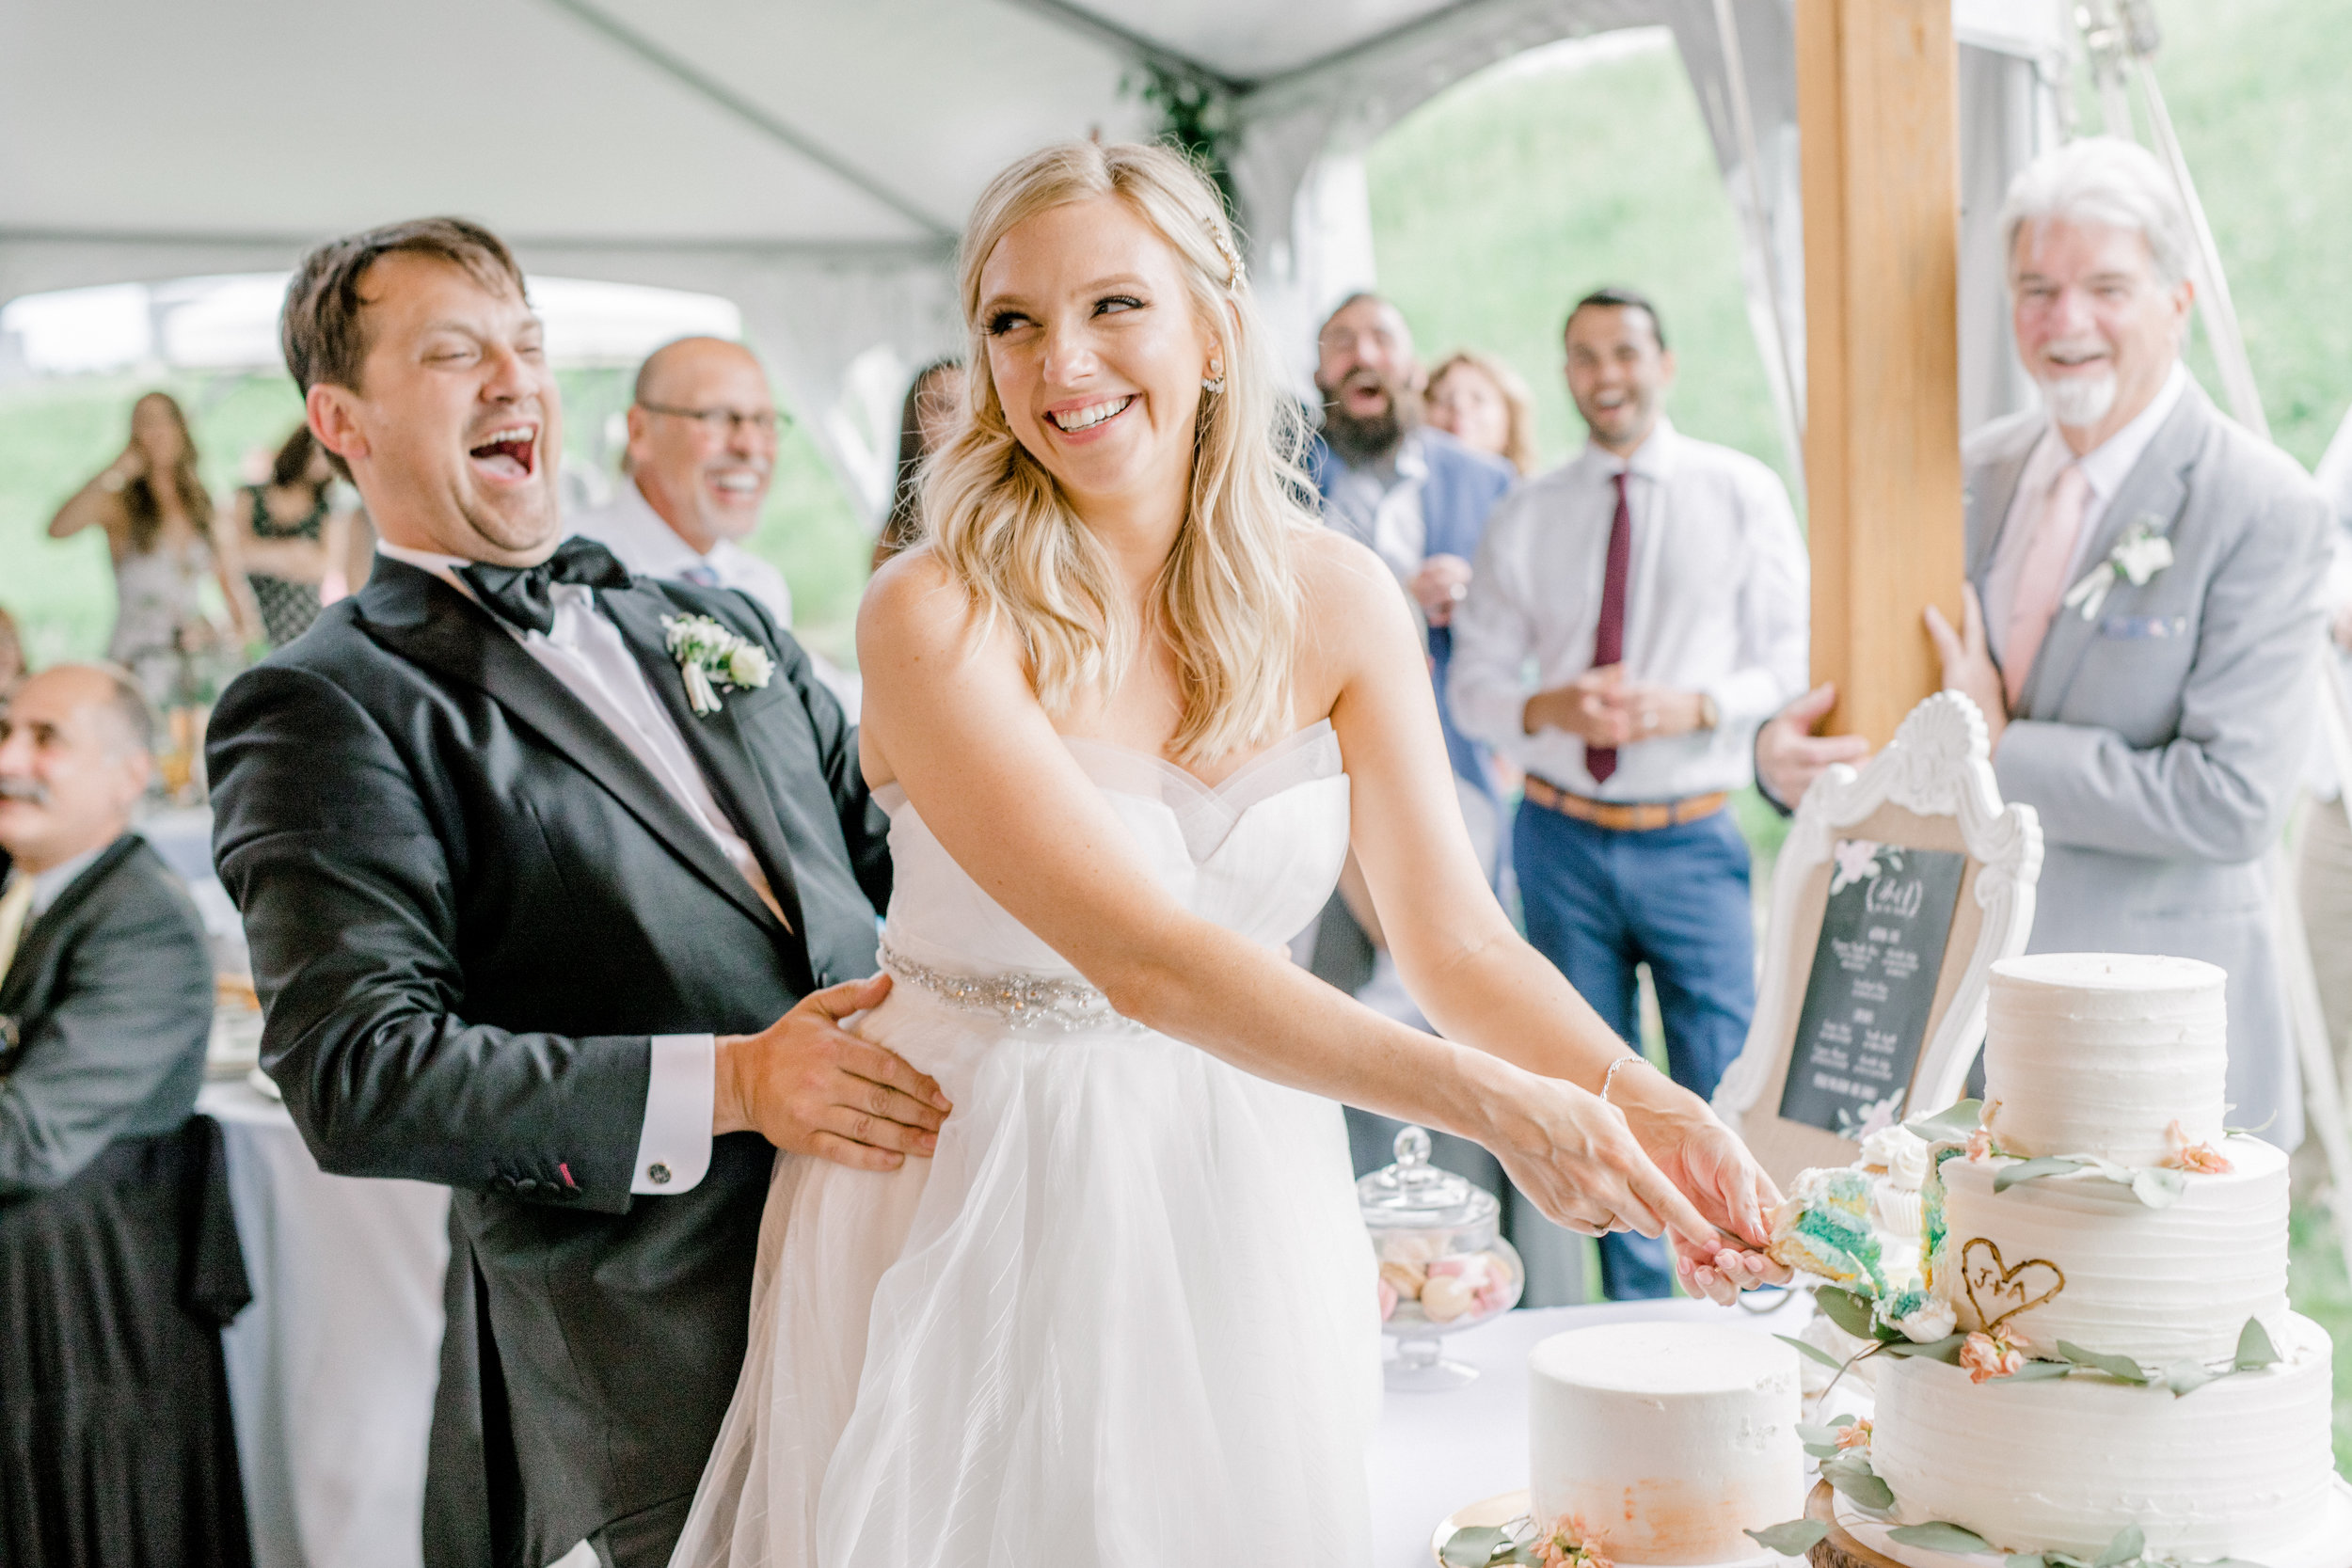 haley-richter-photography-fero-vineyards-summer-wedding-allison-and-josh-winery-pennsylvania-204.jpg